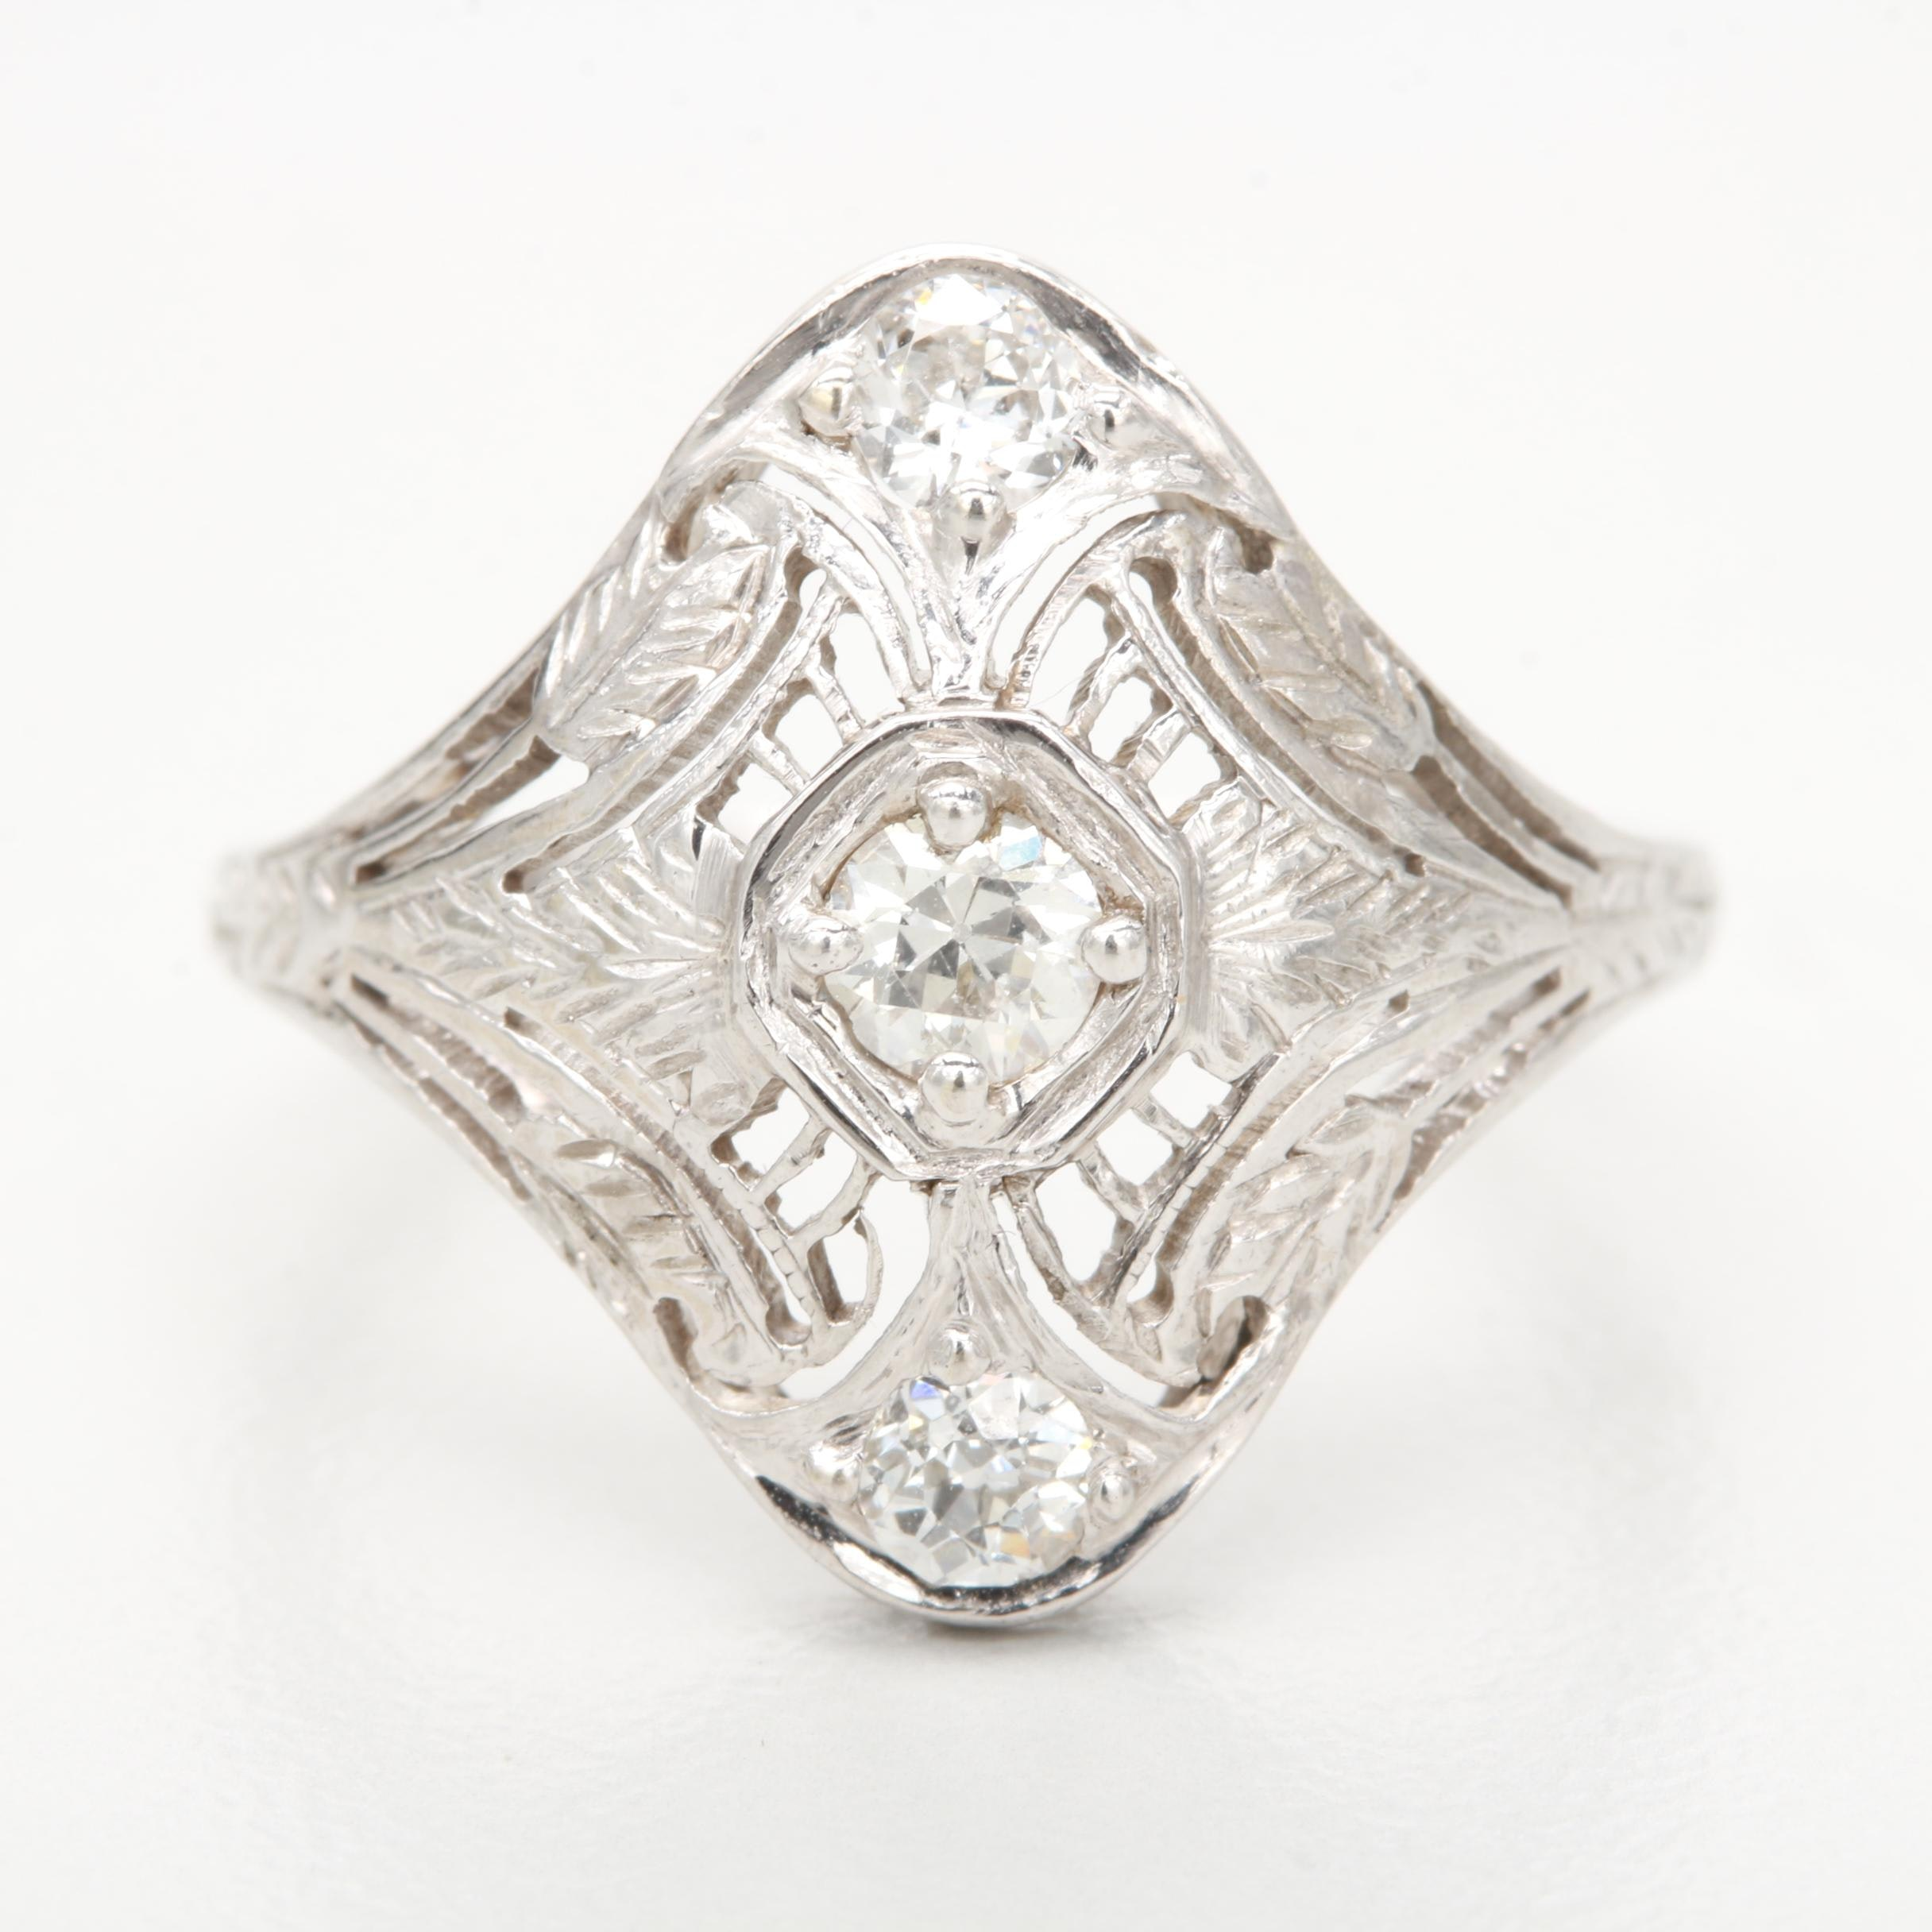 Edwardian 14K White Gold 0.30 CTW Diamond Ring